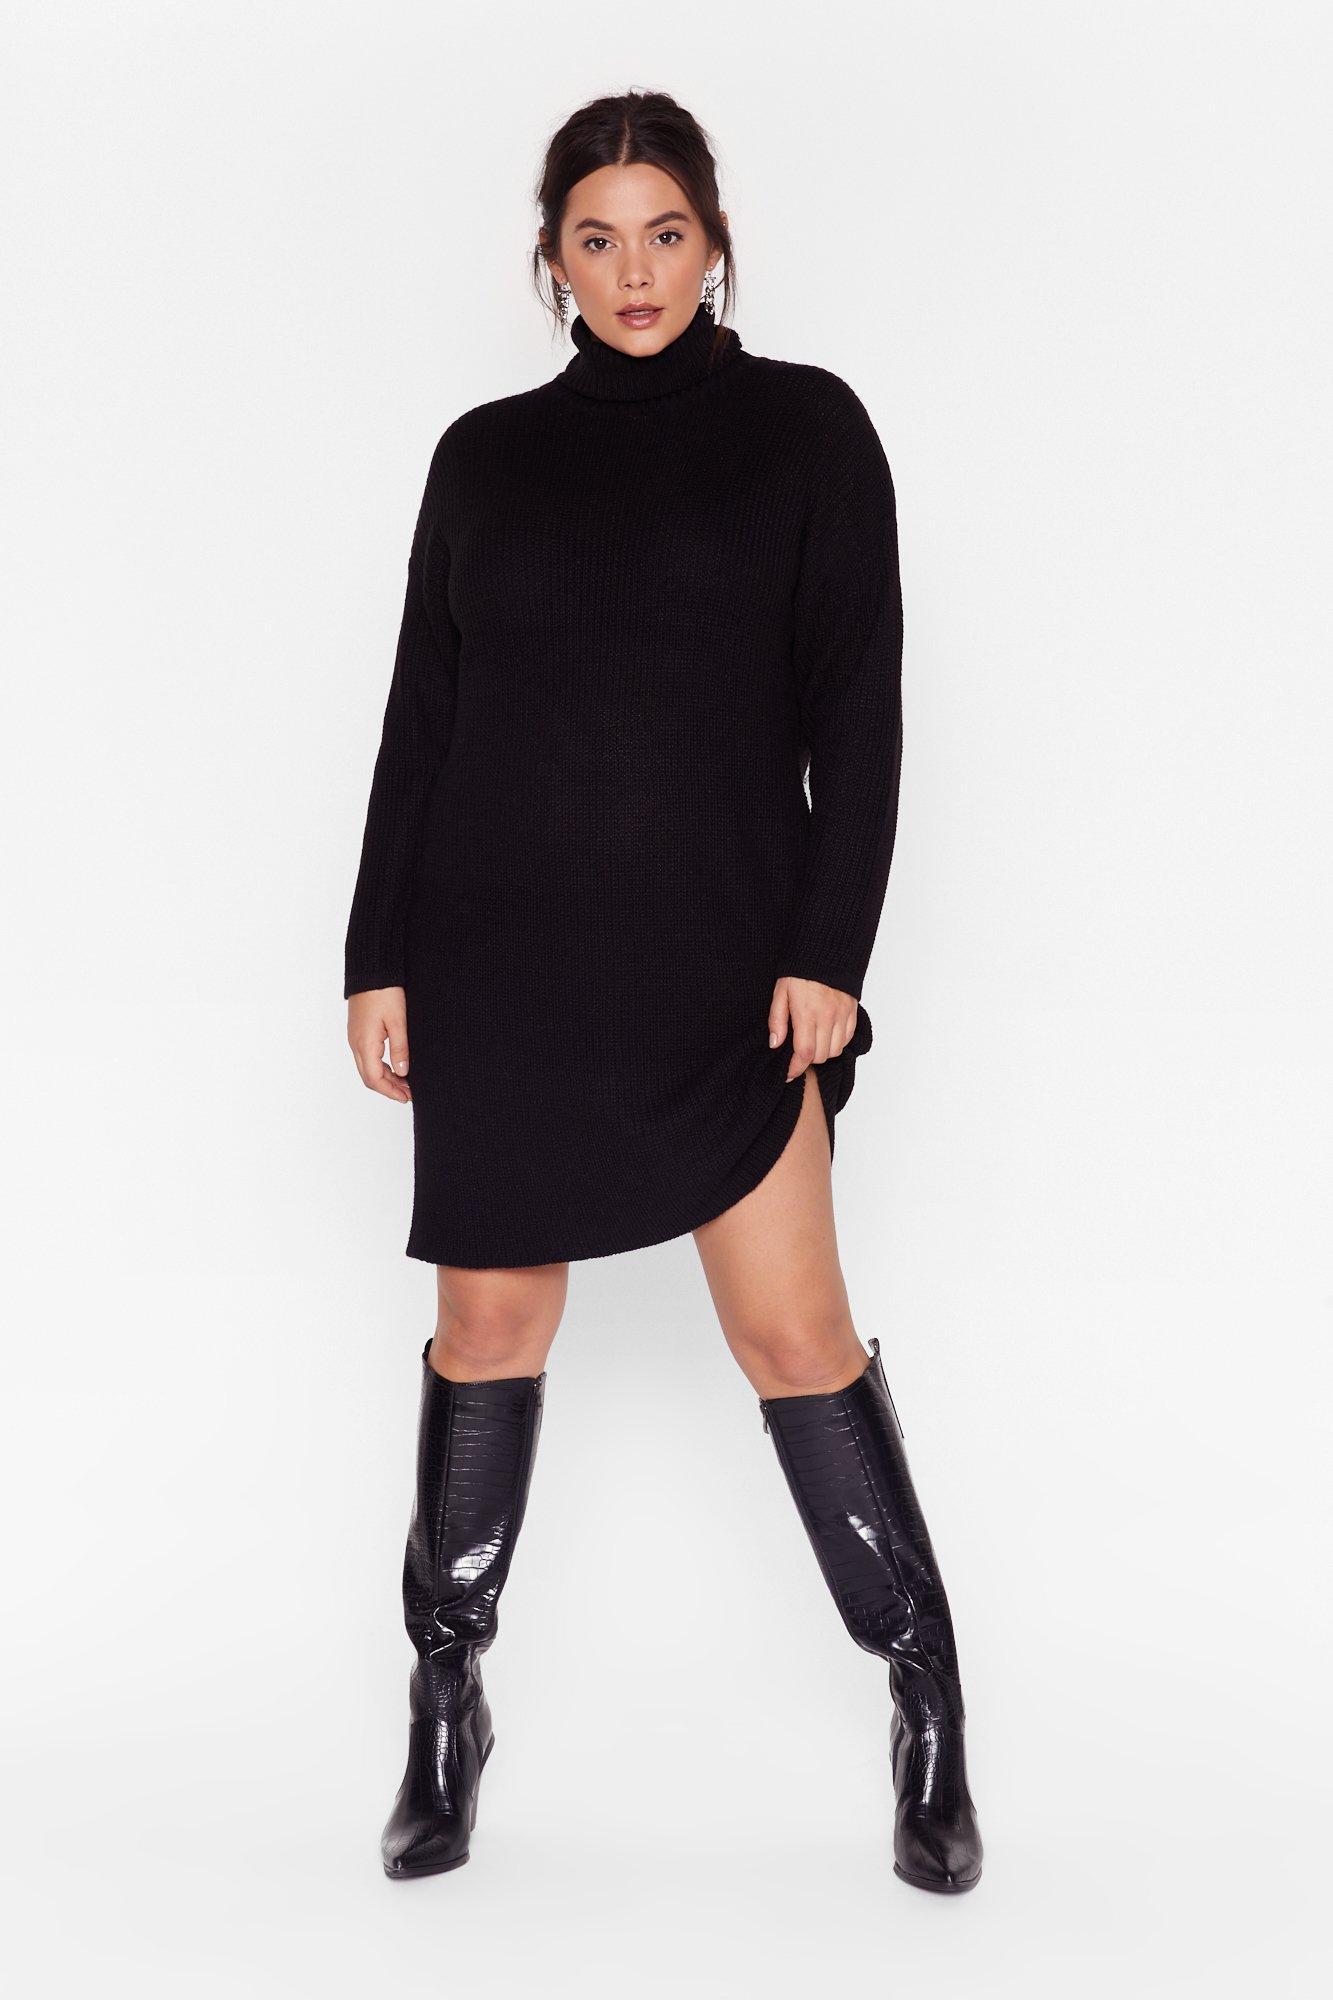 Image of Knit Just Got Better Plus Sweater Dress